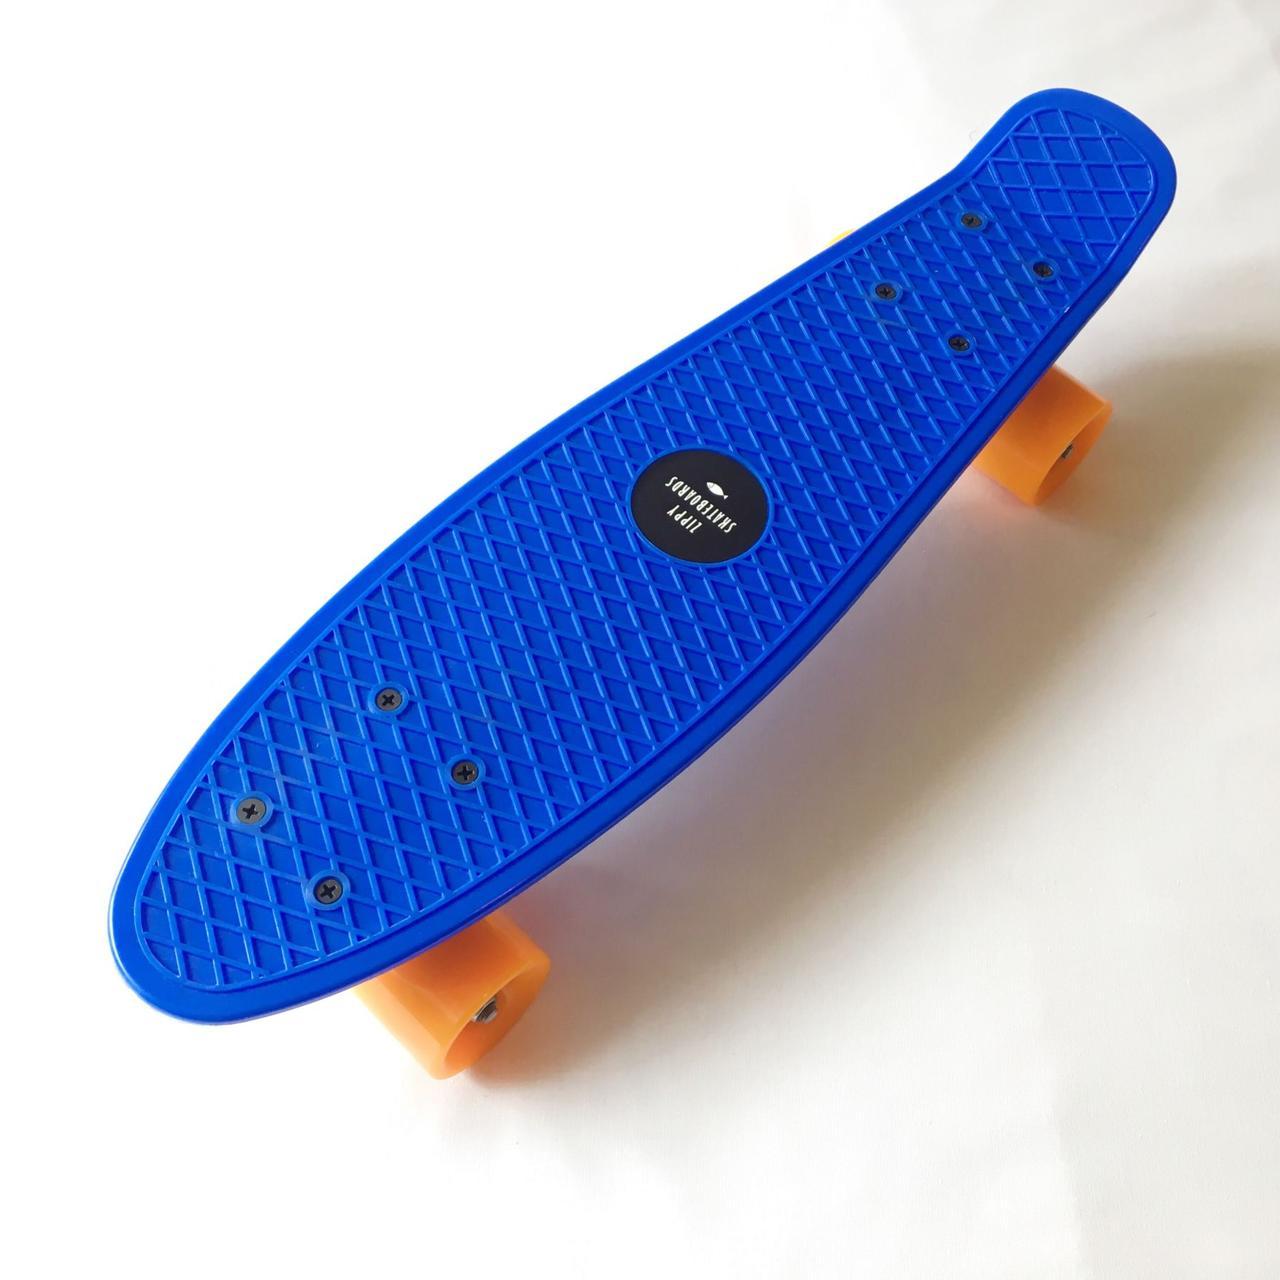 "Penny Board Blue 22"" - Синий 54 см пенни борд"